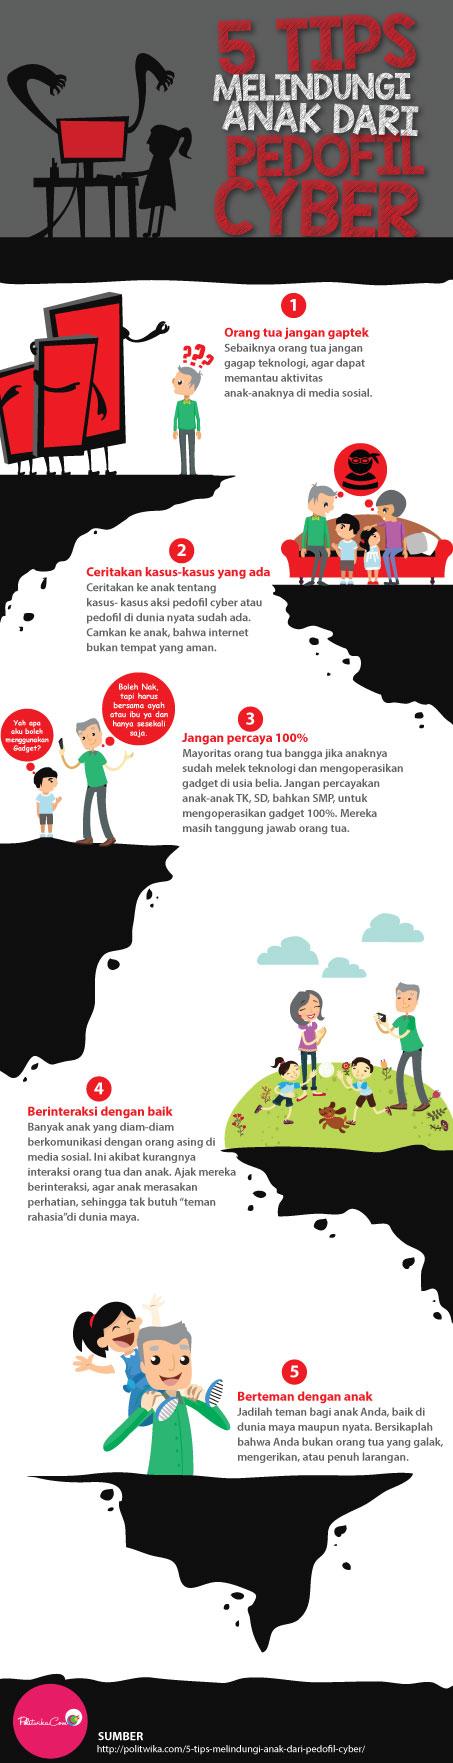 infografik-pedofil-cyber